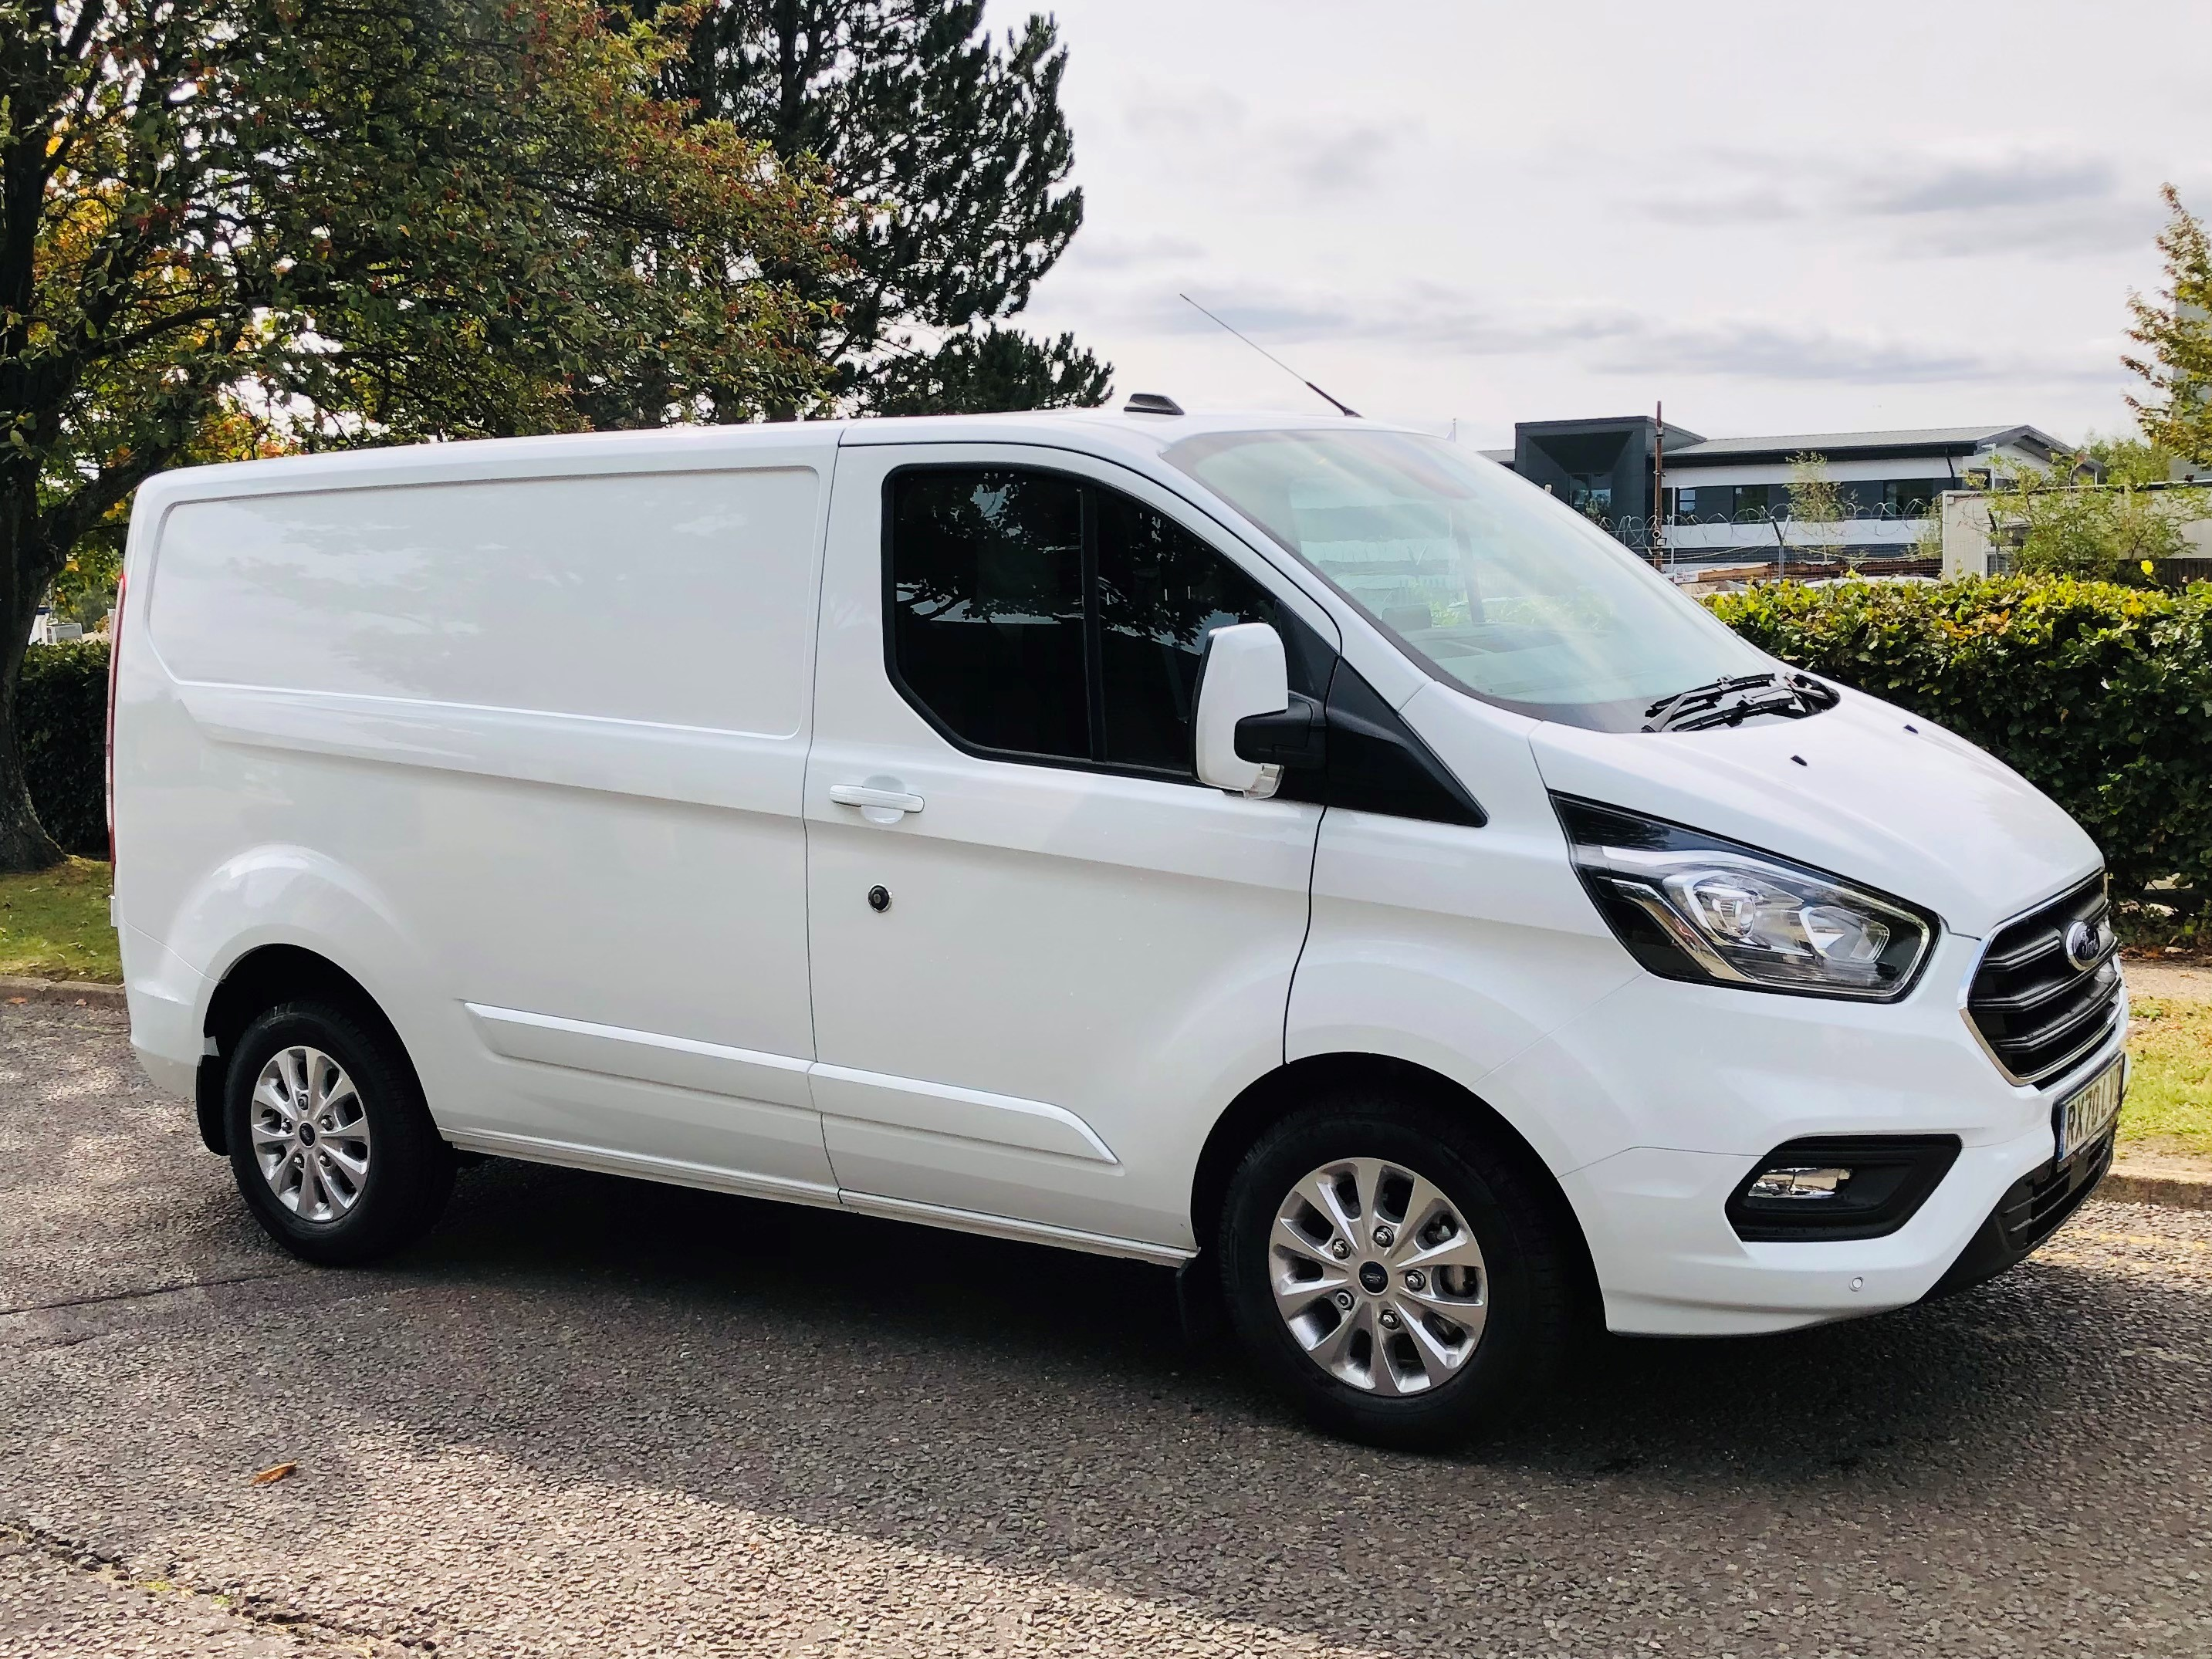 vehicle sales smarthire vehicle rental newbury. Black Bedroom Furniture Sets. Home Design Ideas